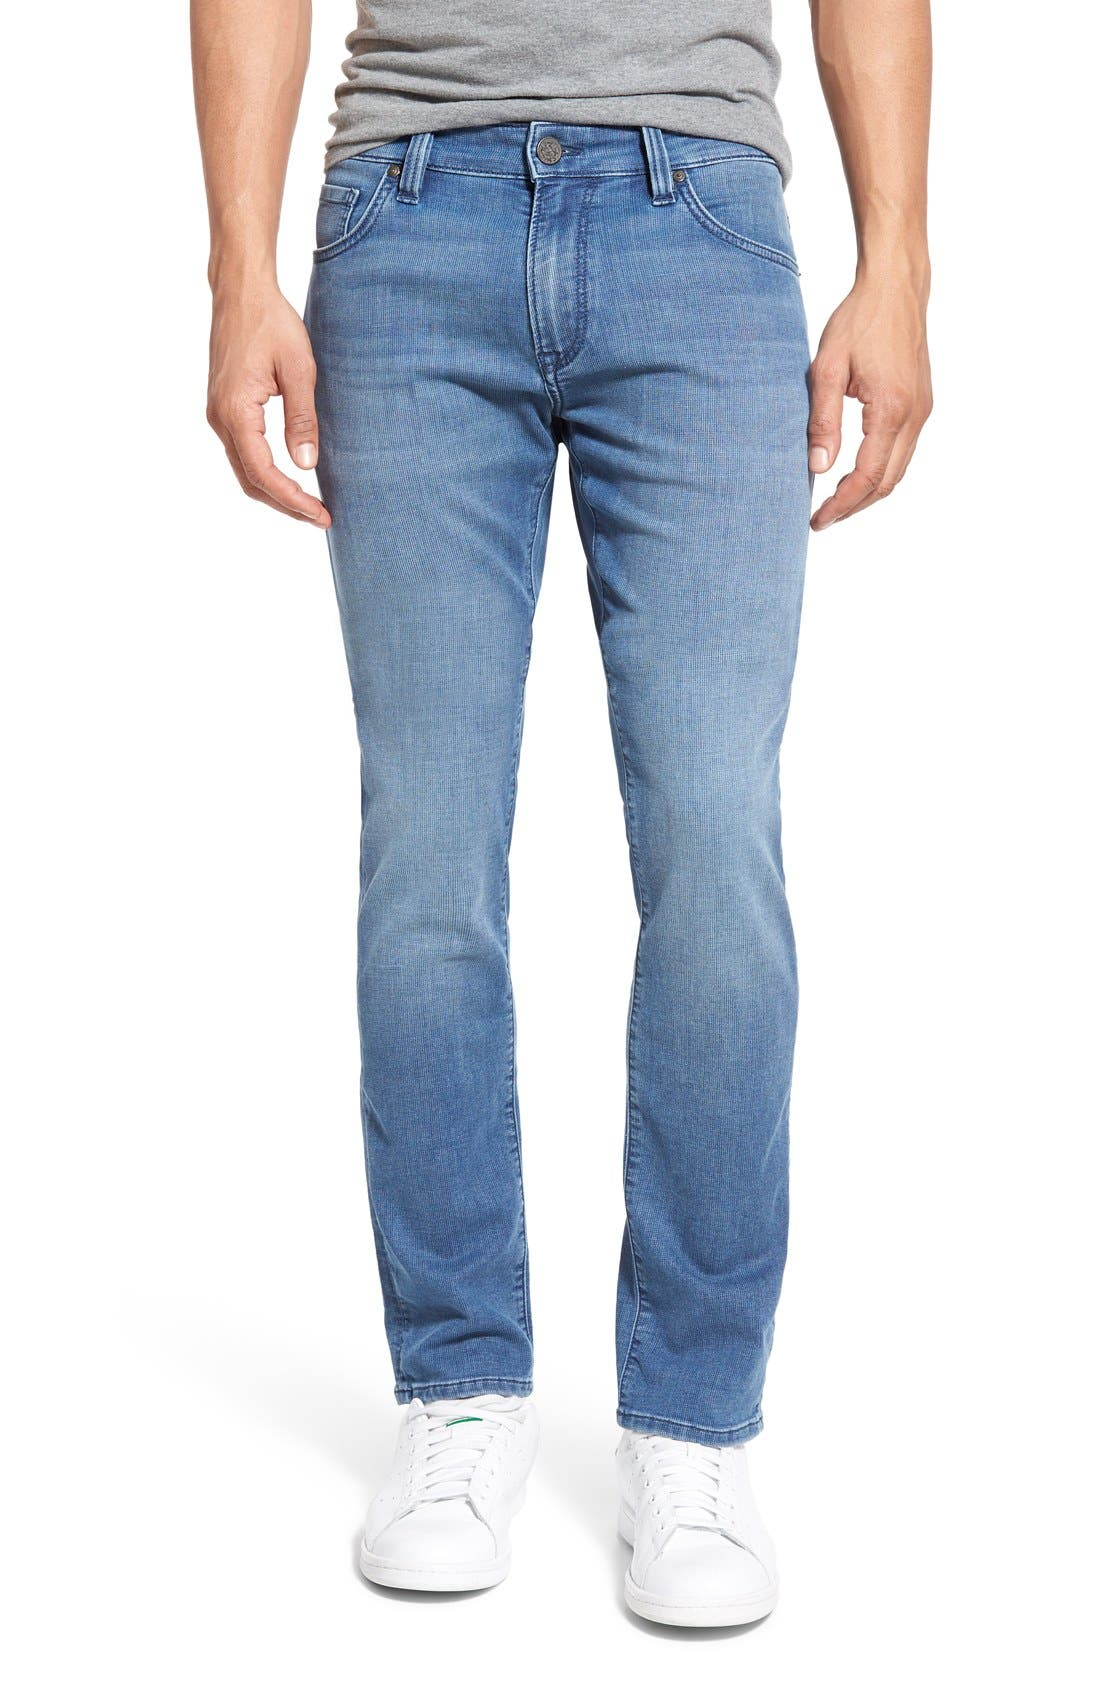 34 HERITAGE 'Courage' Straight Leg Jeans, Main, color, LIGHT INDIGO SPORTY